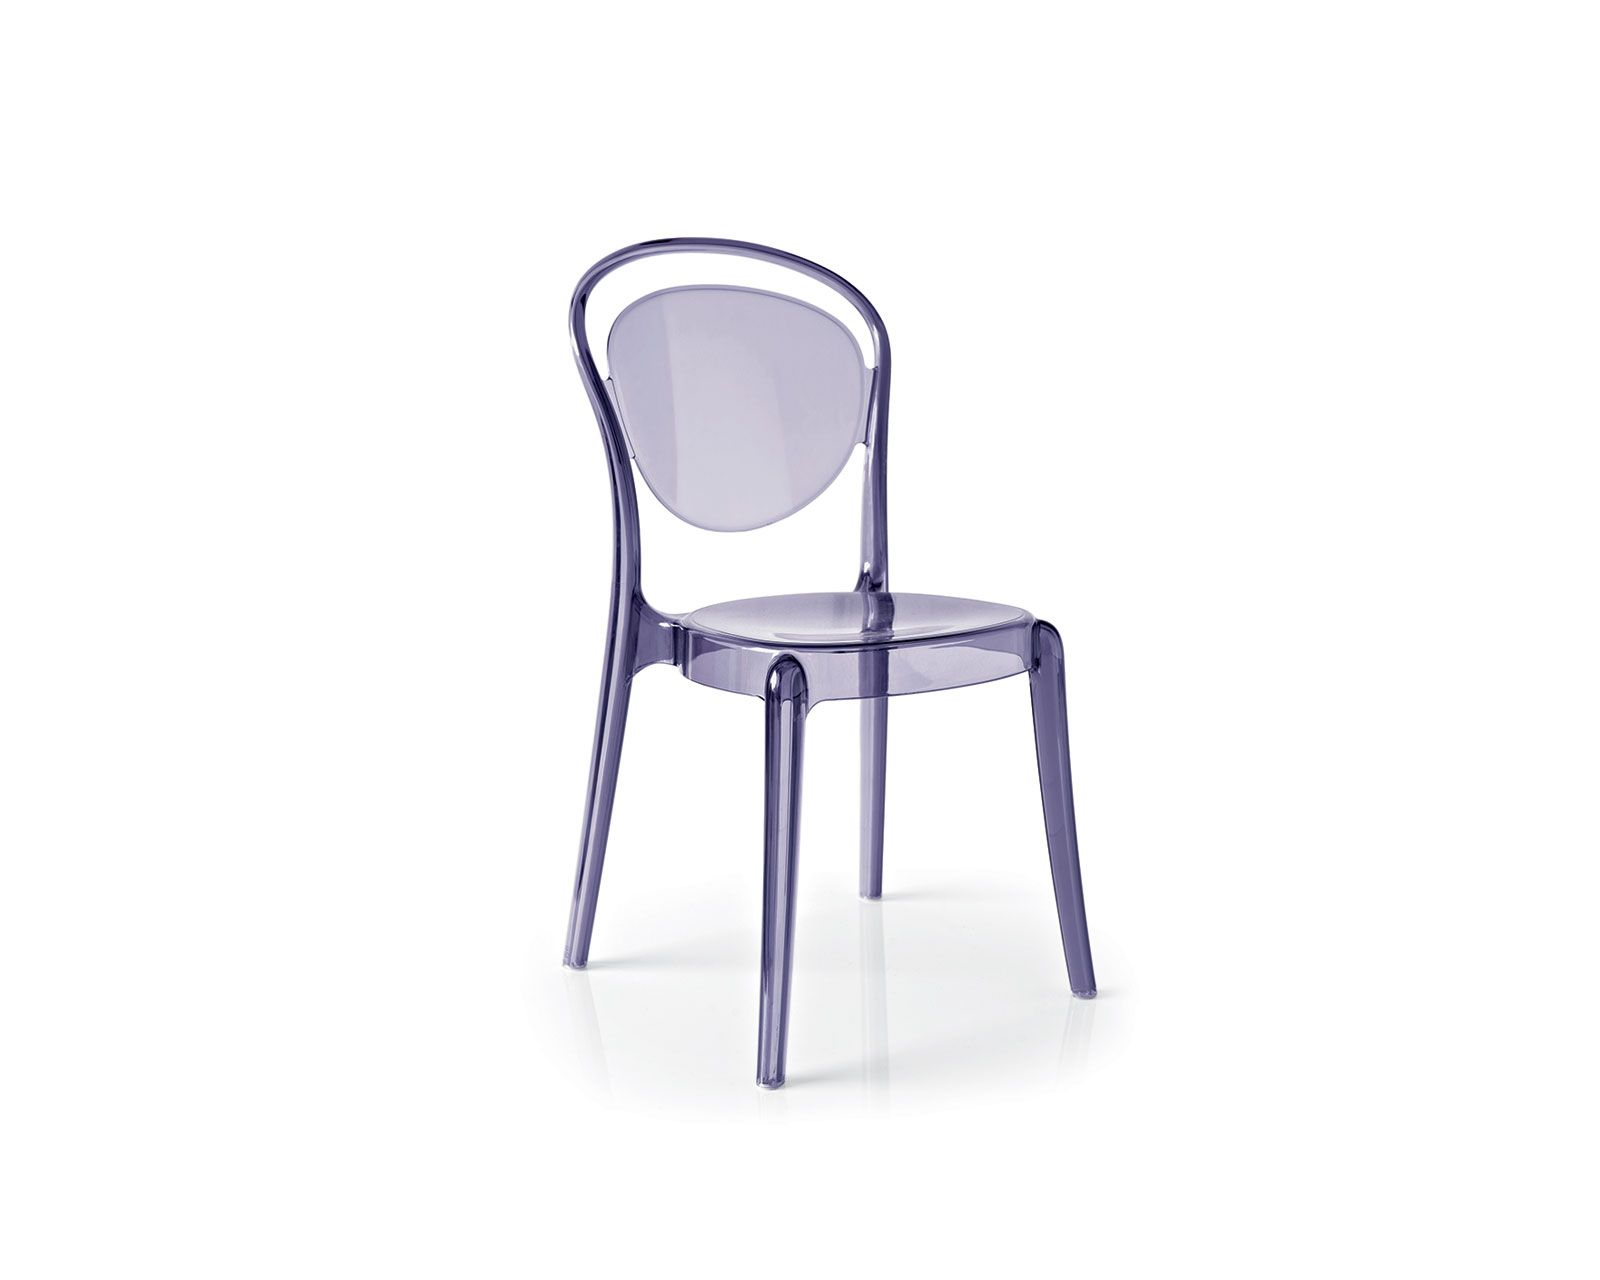 PARISIENNE CS1263 | Sedie, Smart design